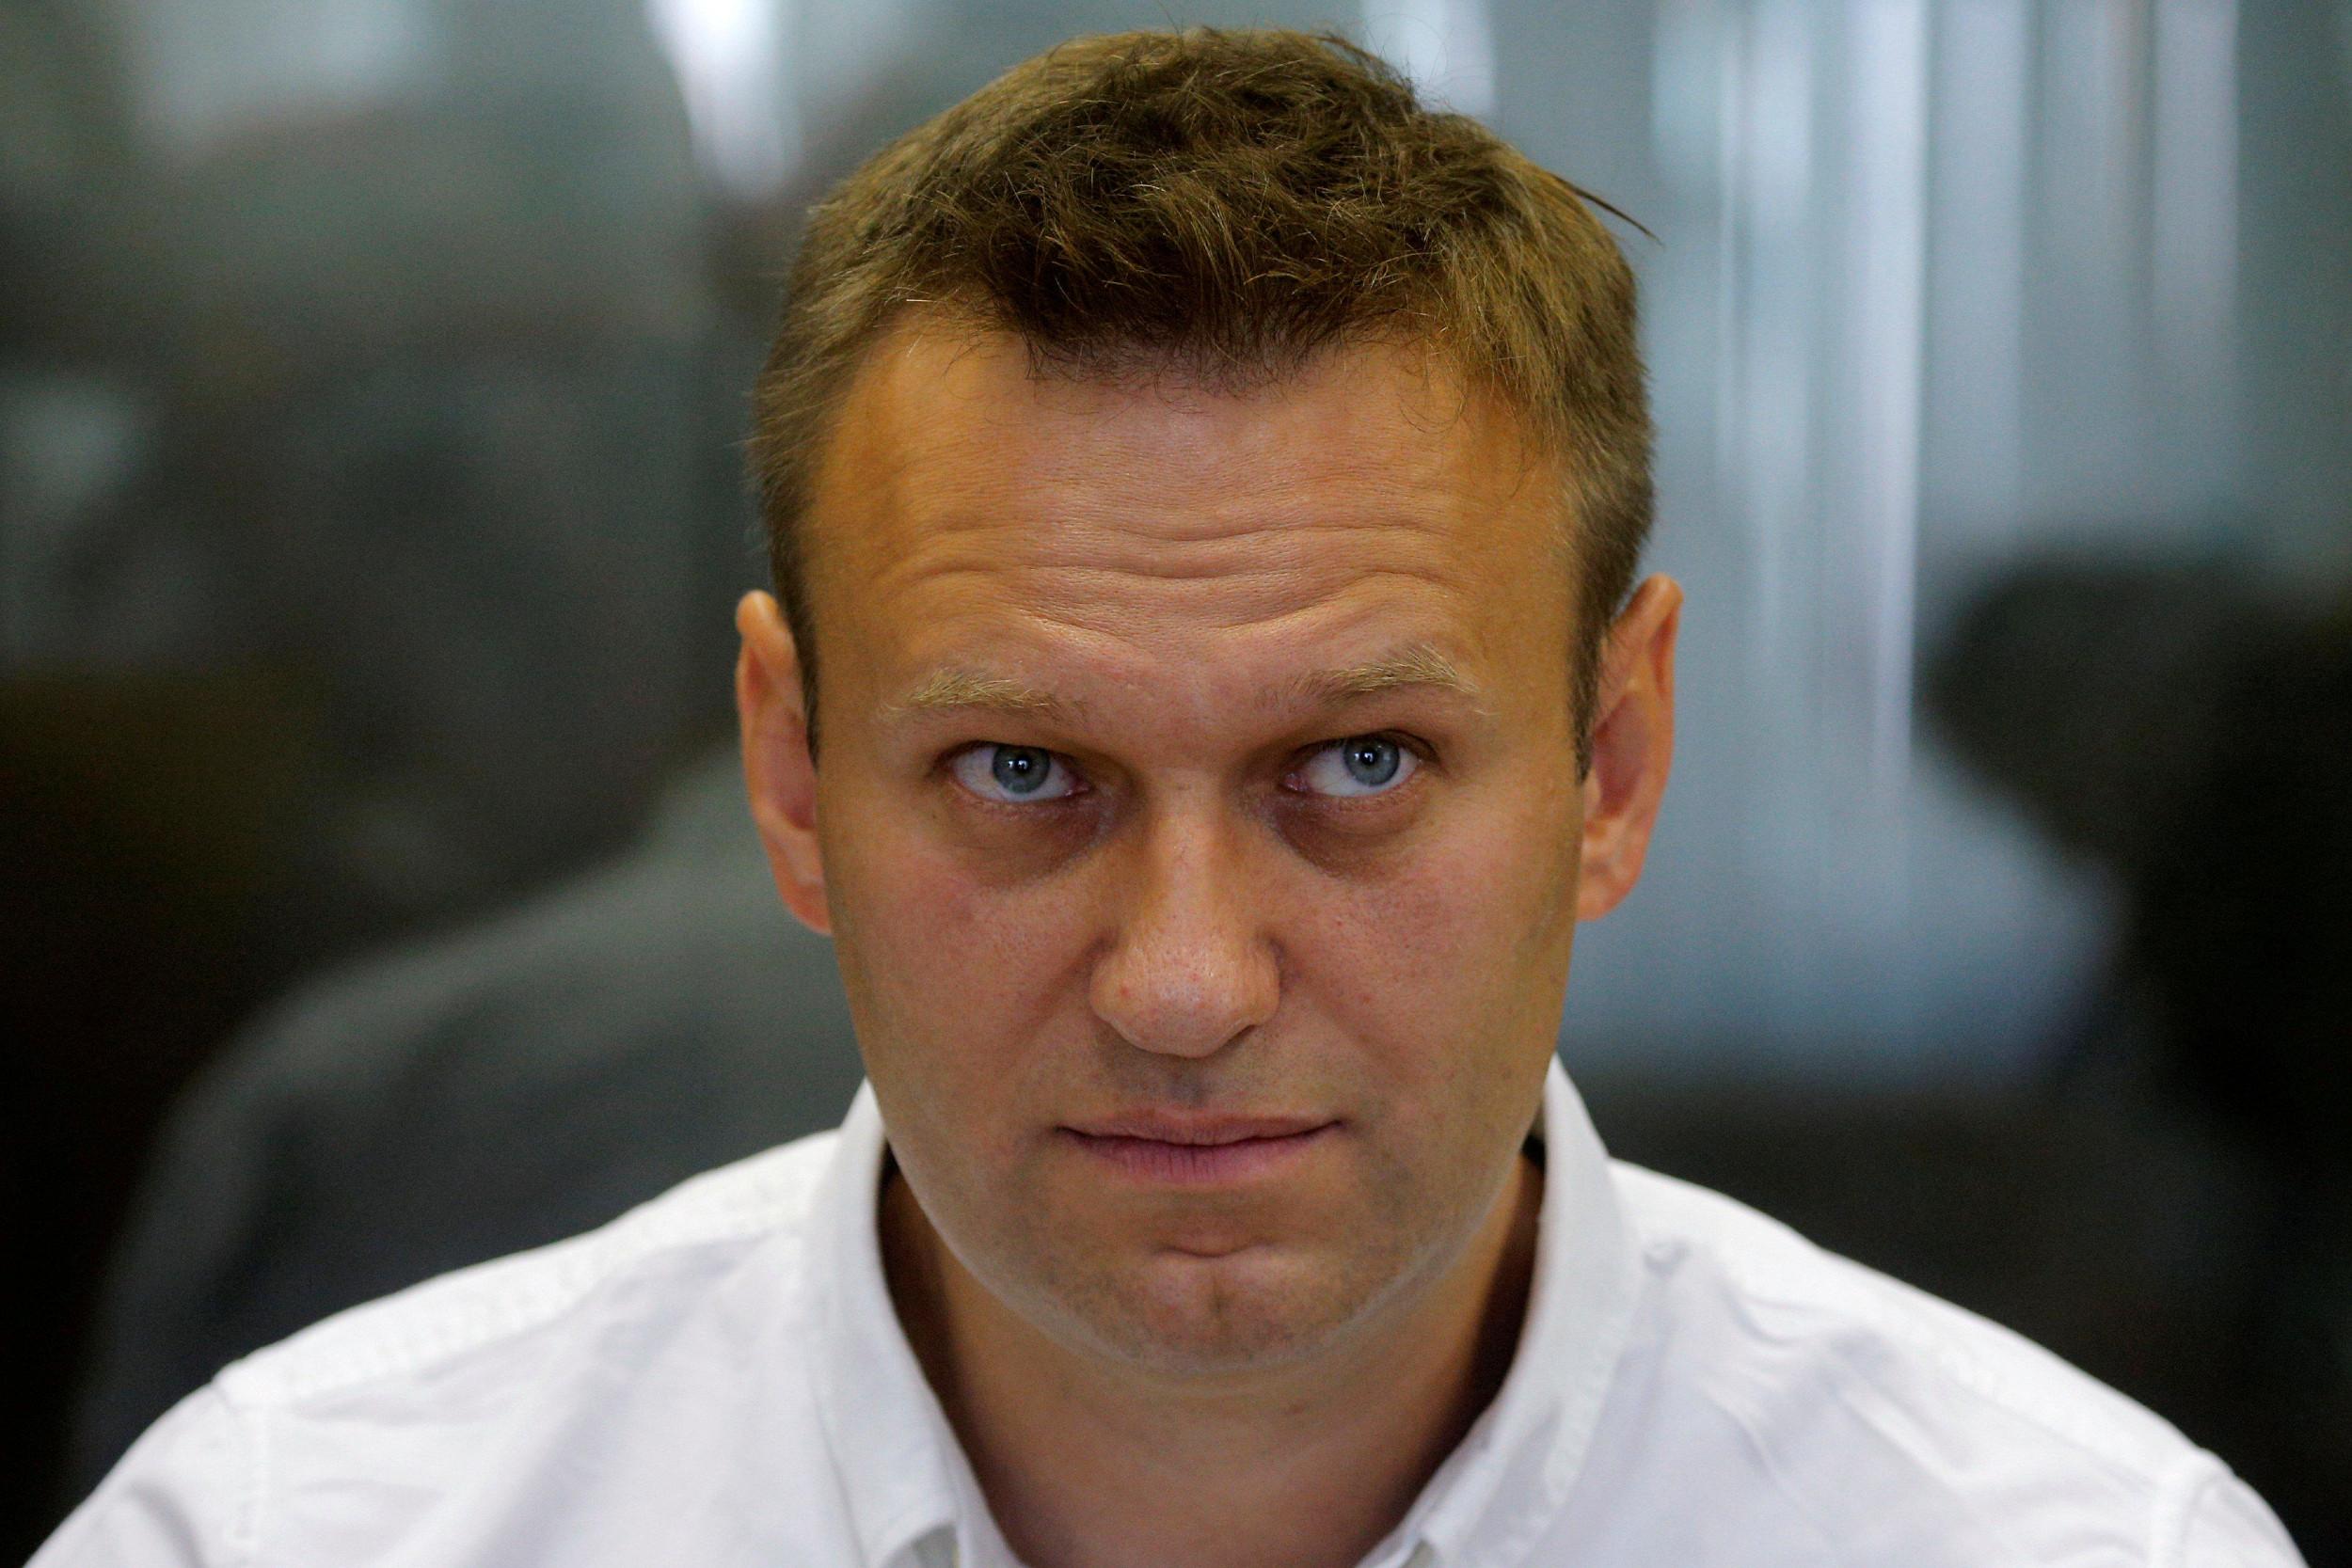 Руски опозициони лидер Алексеј Наваљни (Фото: AP)